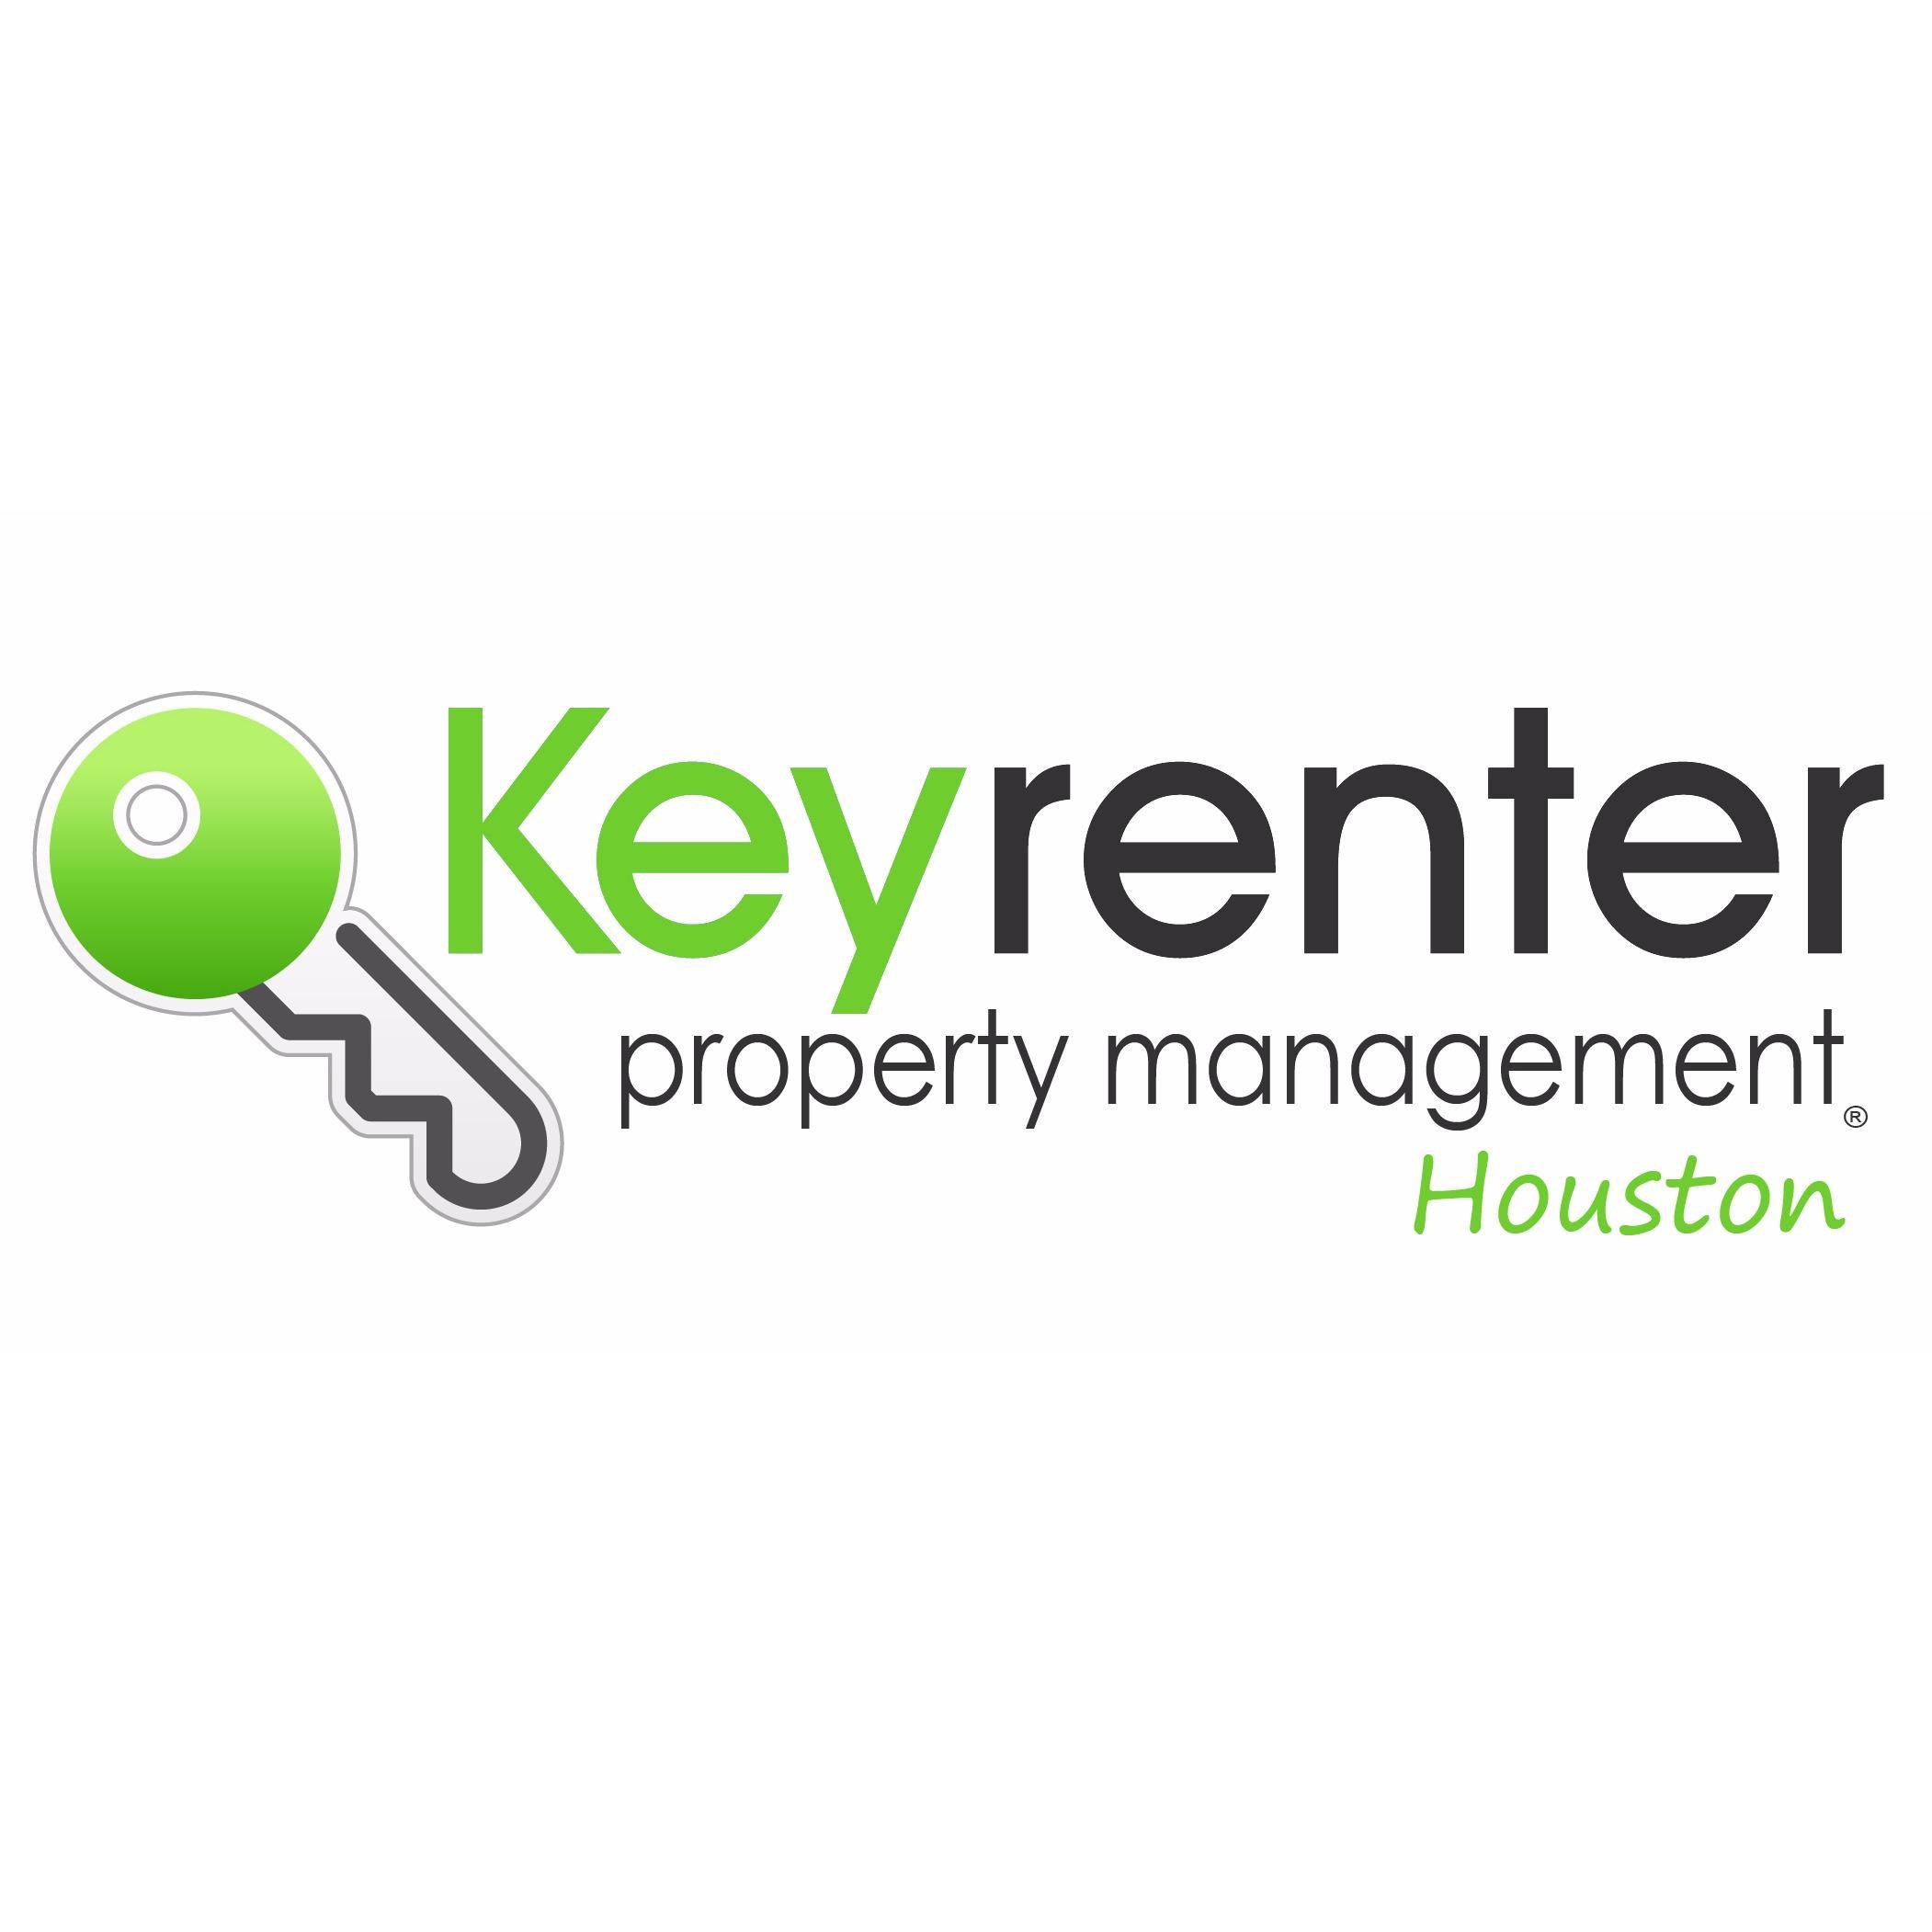 Keyrenter Property Management Houston